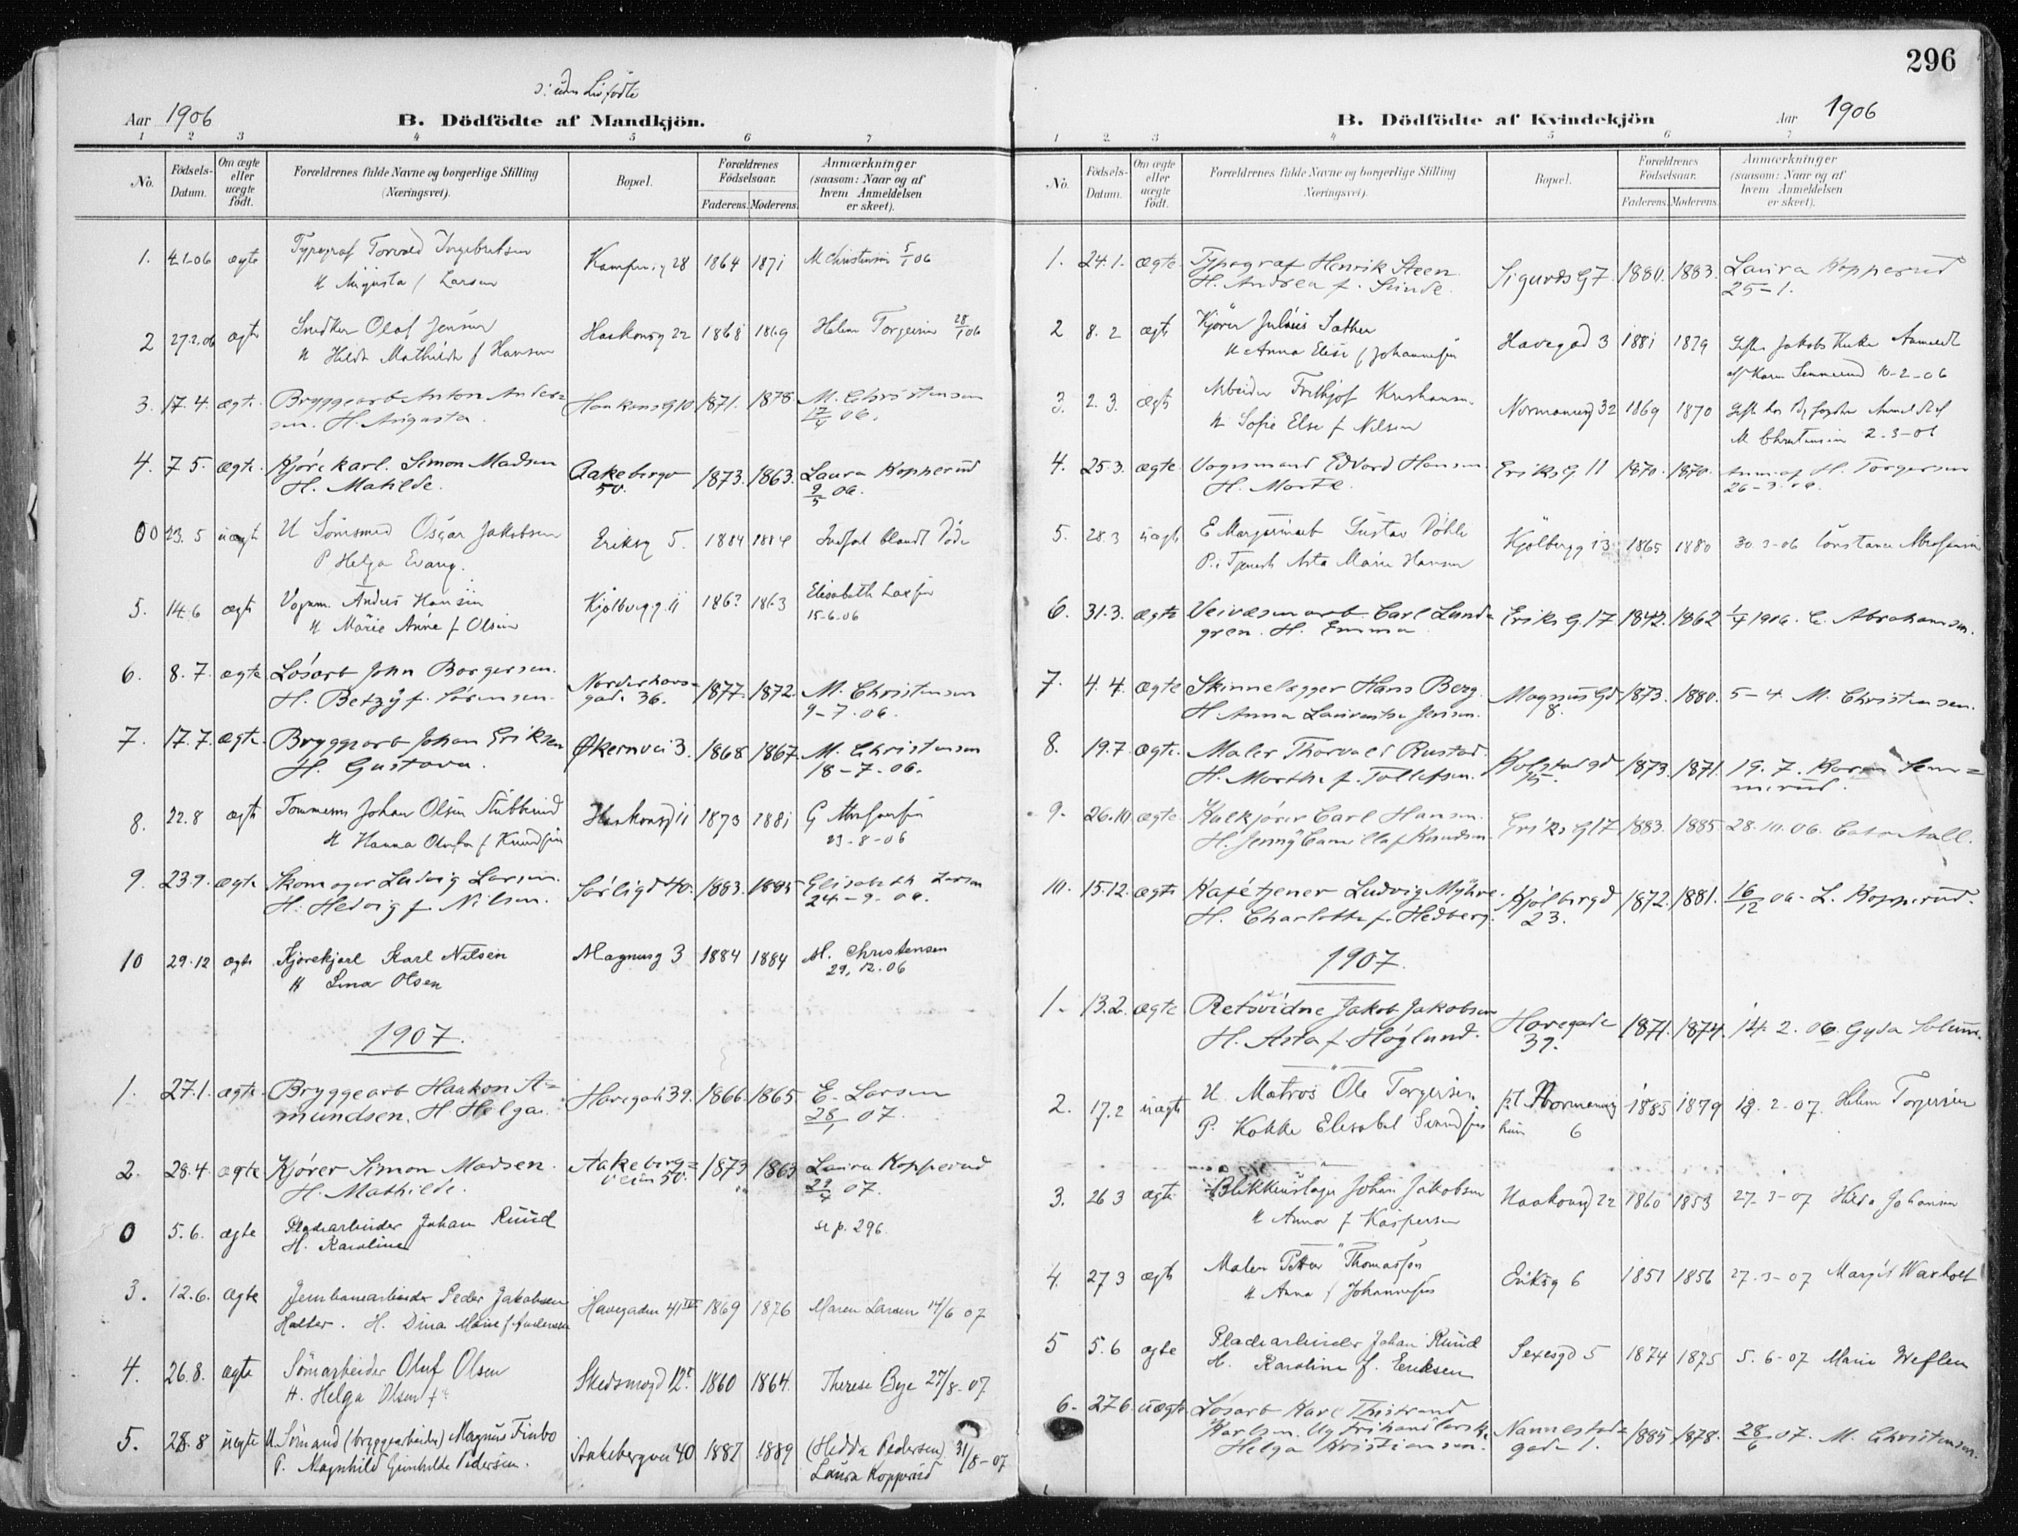 SAO, Kampen prestekontor Kirkebøker, F/Fa/L0010: Ministerialbok nr. I 10, 1905-1917, s. 296